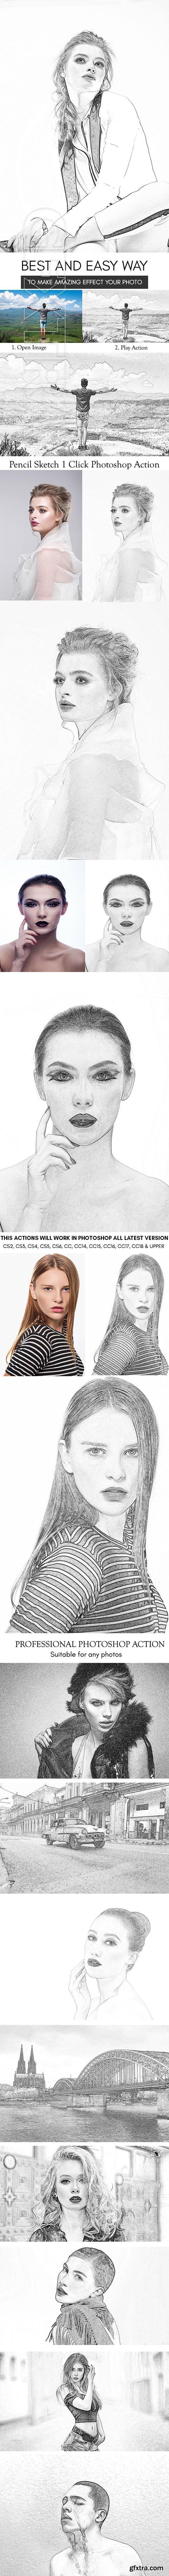 GraphicRiver - Pencil Skectch Photoshop Action 21901956